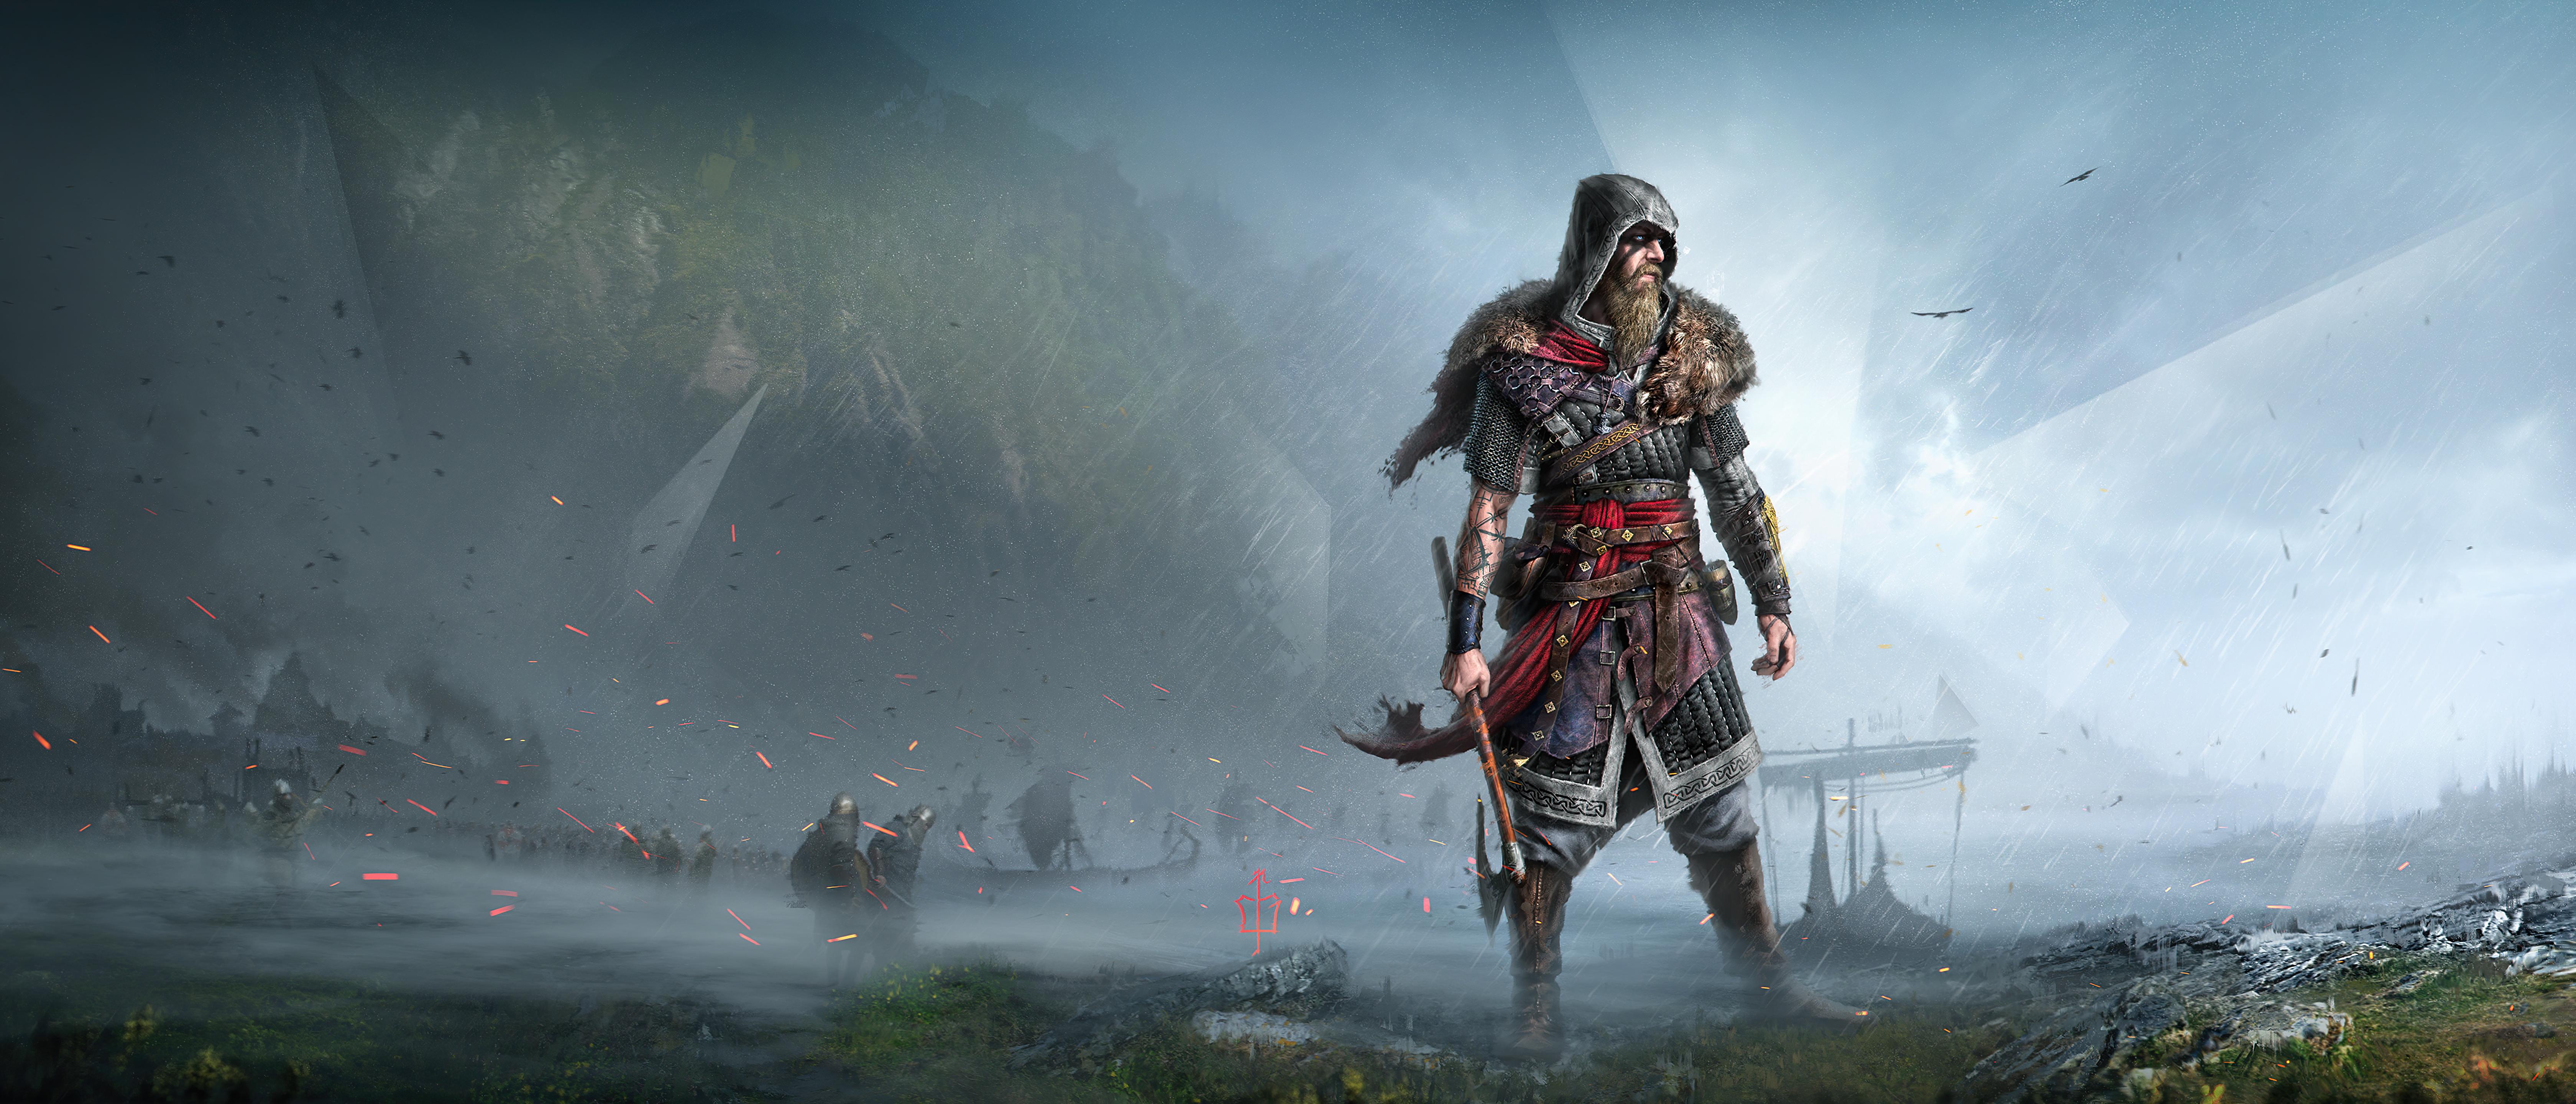 Assassin S Creed Valhalla 4k Wallpaper Viking Raider Fan Art Pc Games Playstation 4 Playstation 5 Xbox One Games 1185